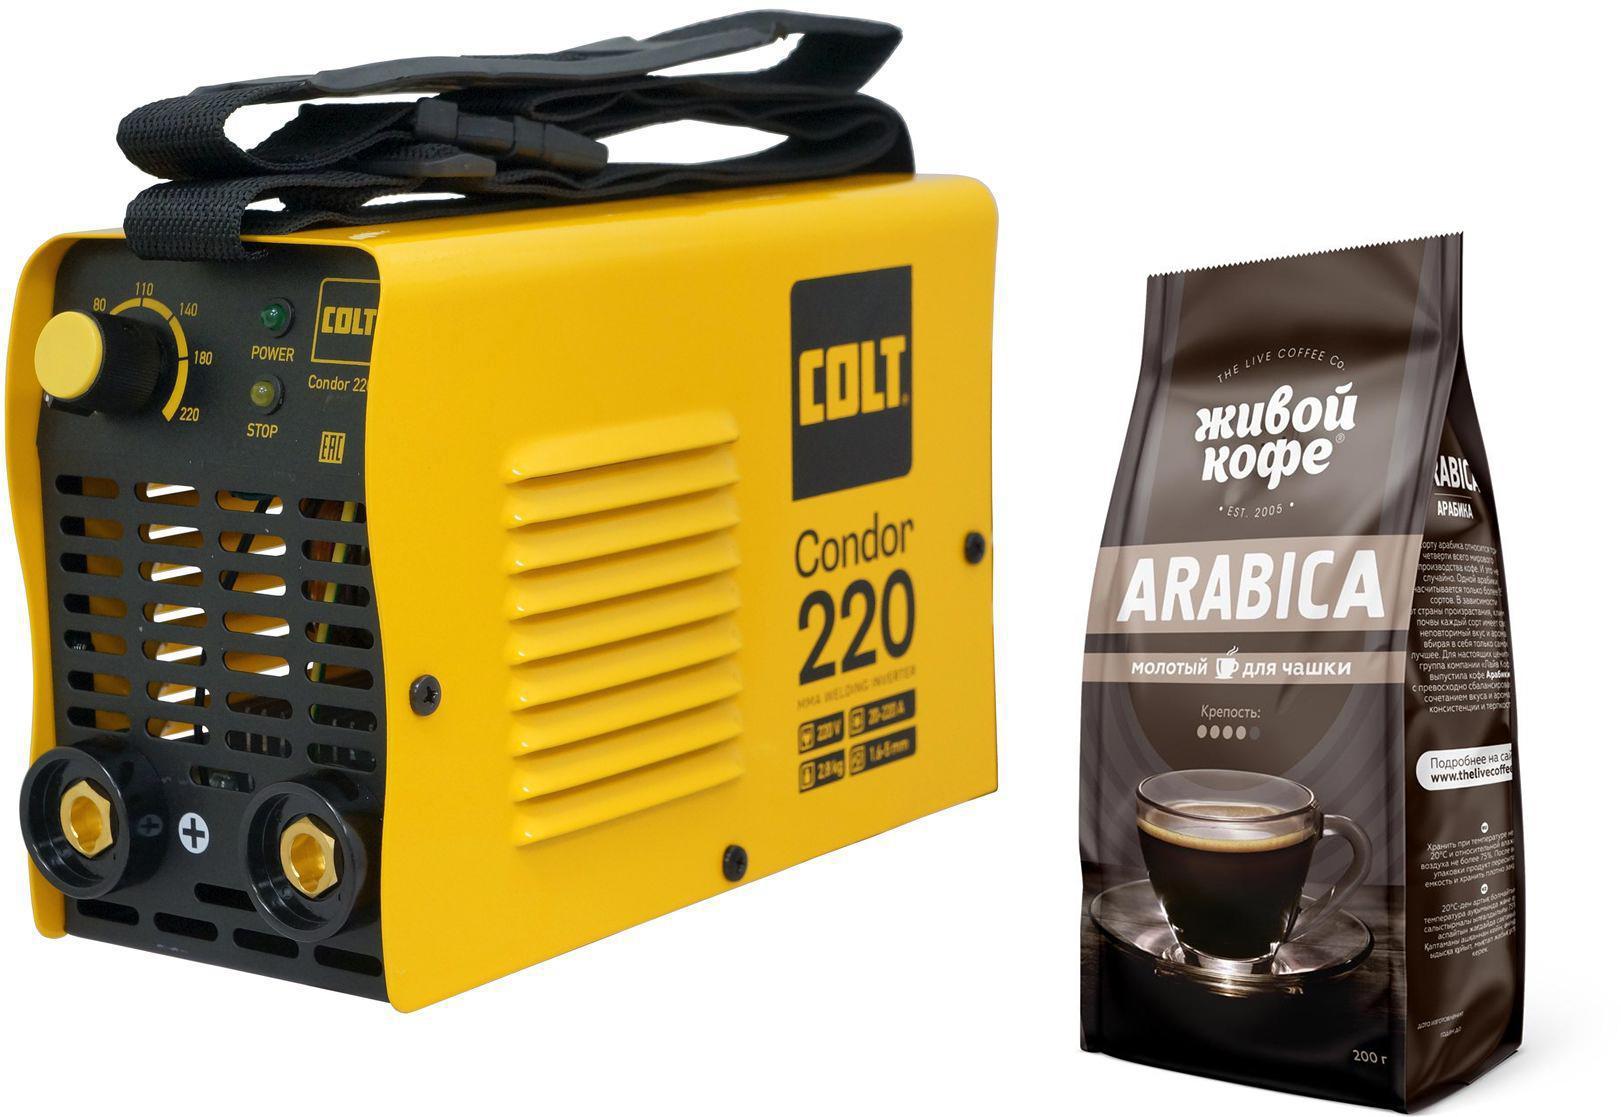 Набор Colt Инвертор condor 220 (50030) +Арабика молотый - упак. 200г (темная пачка)